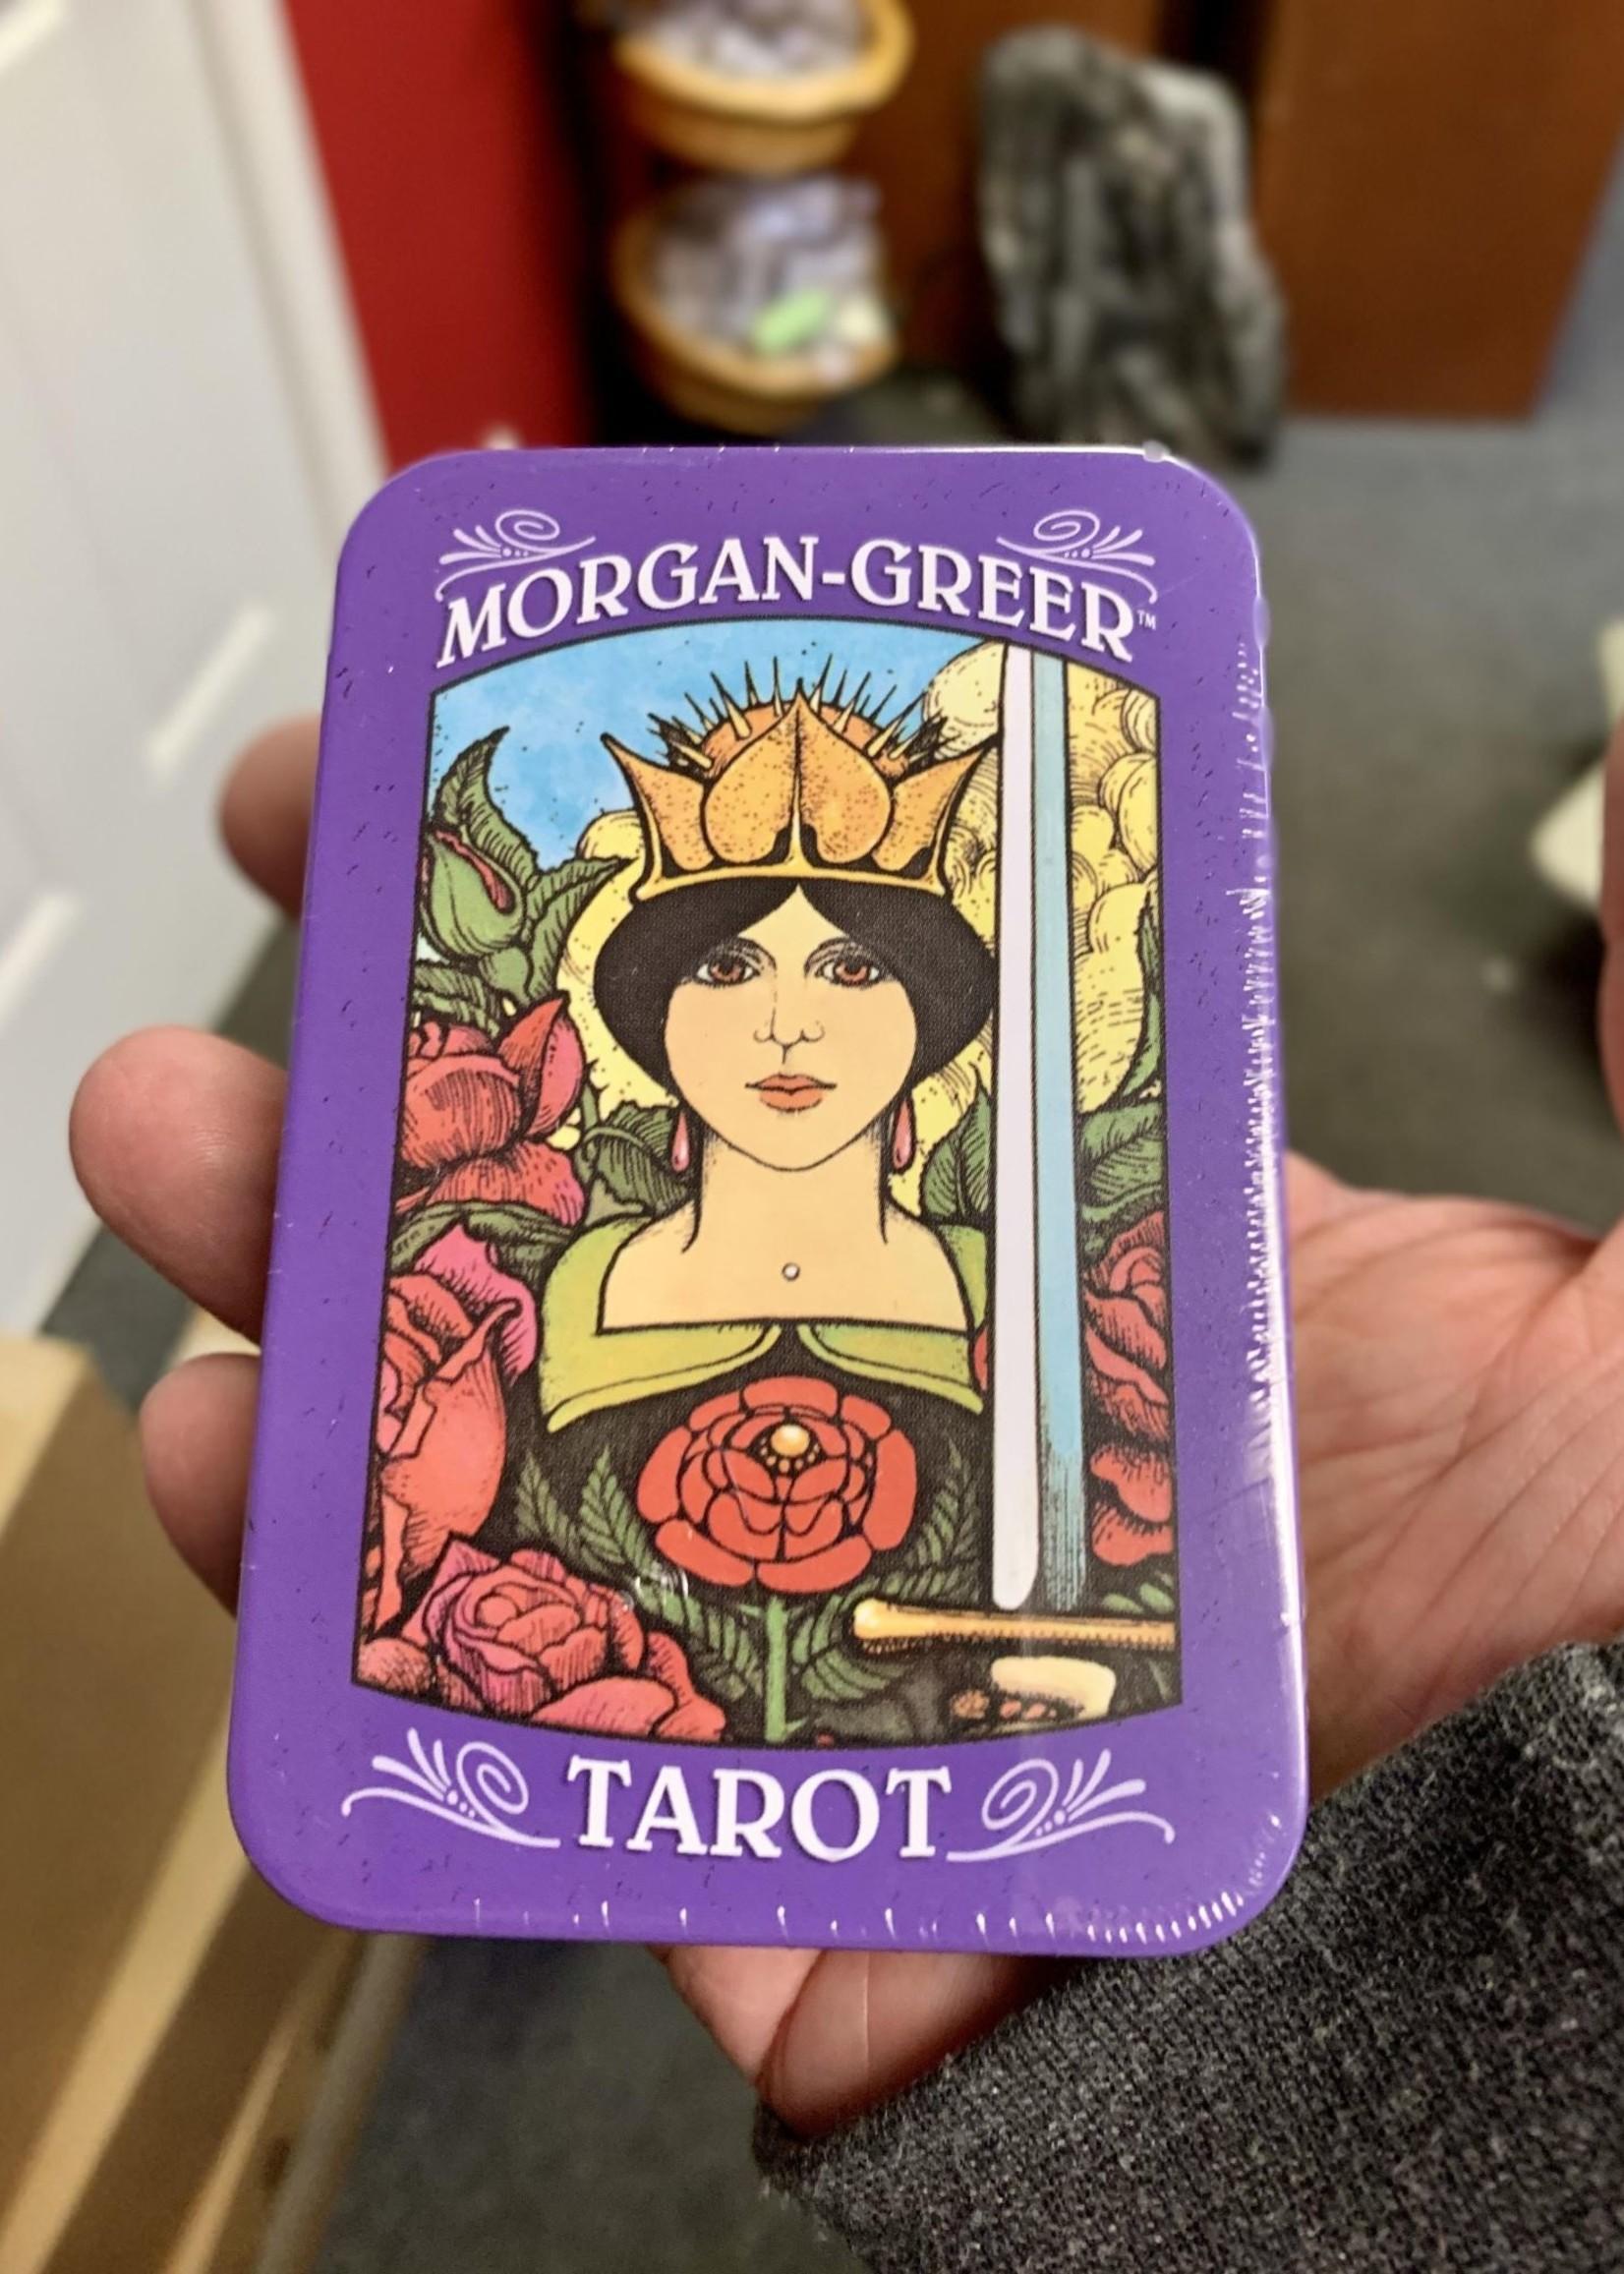 Morgan-Greer Tarot - In a Tin